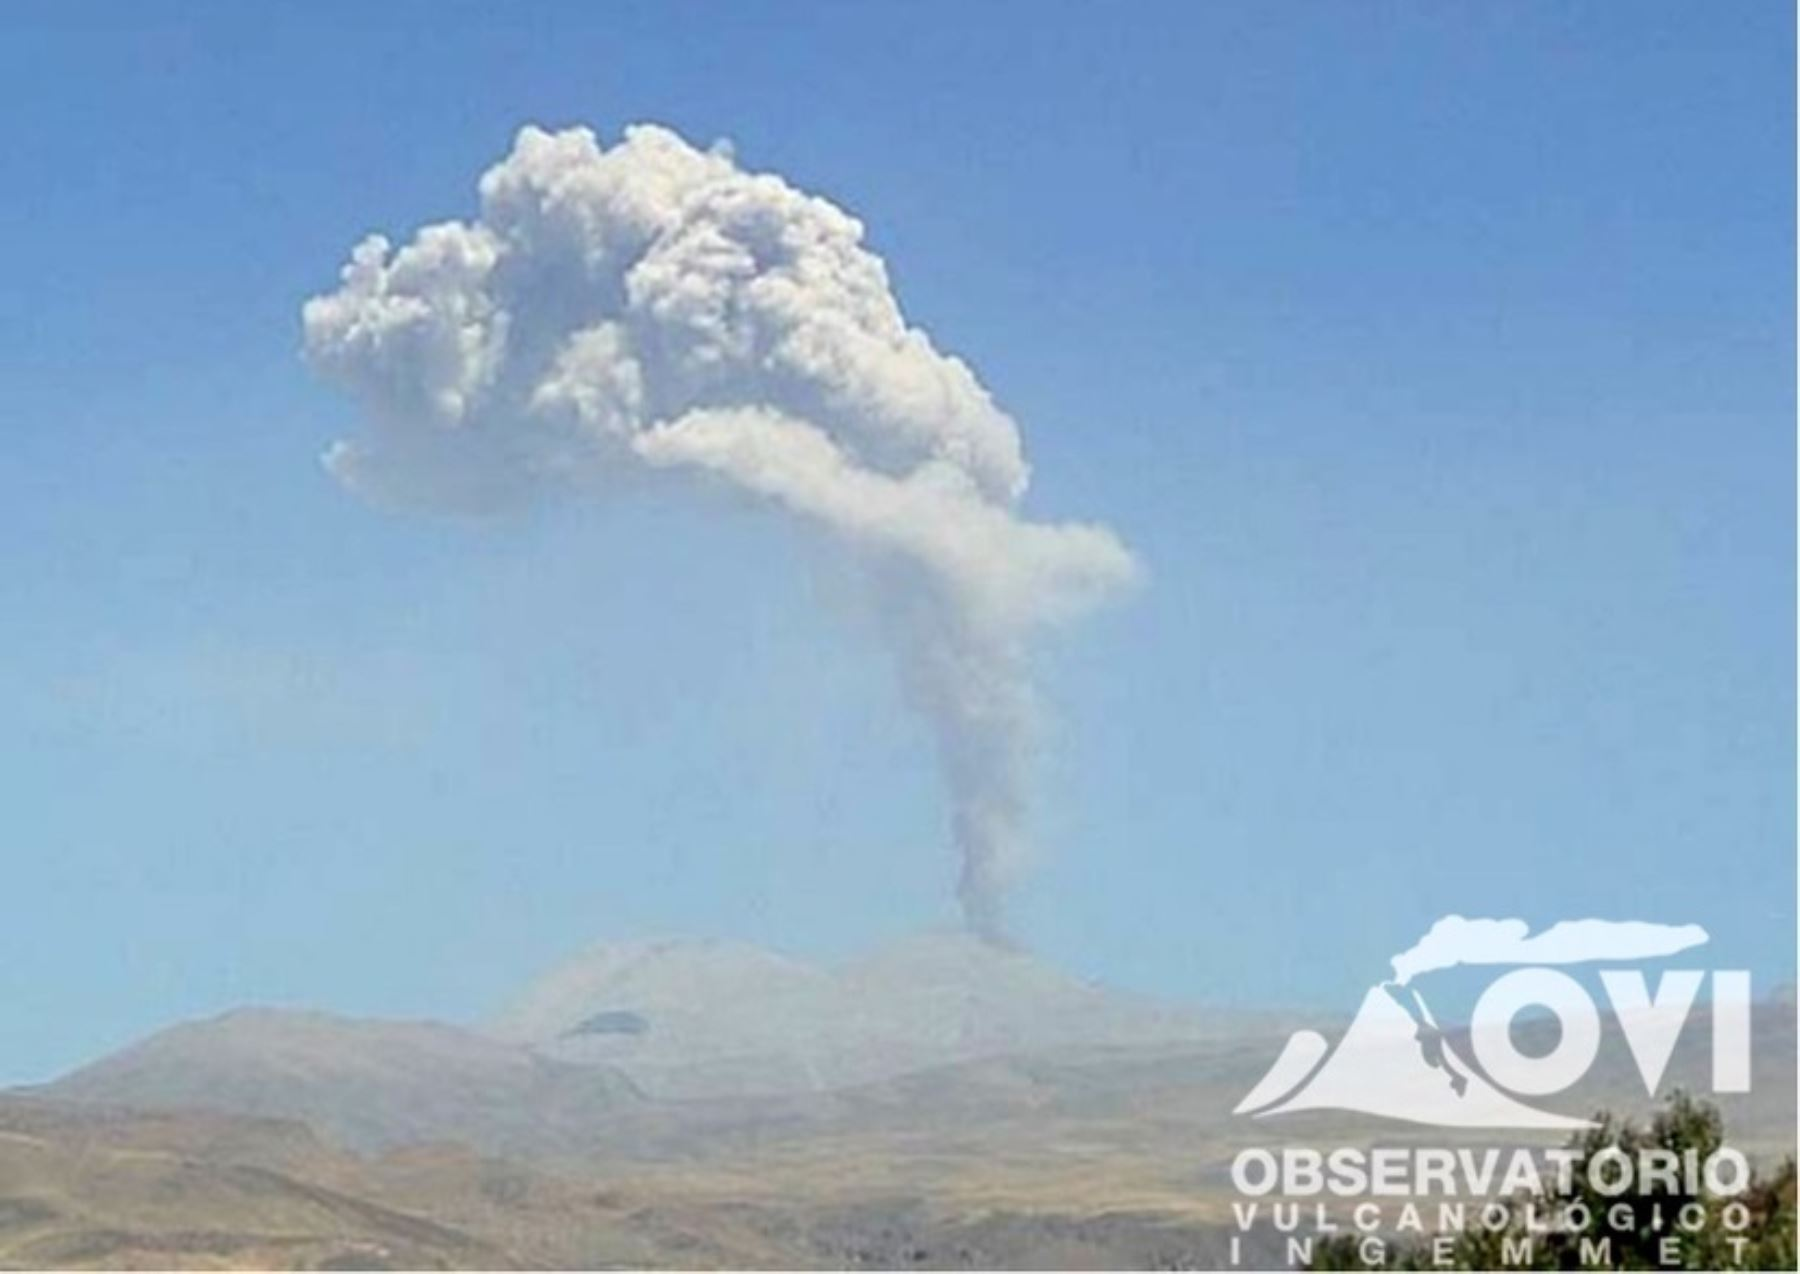 Actividad del volcán Sabancaya está en niveles moderados. ANDINA/Difusión